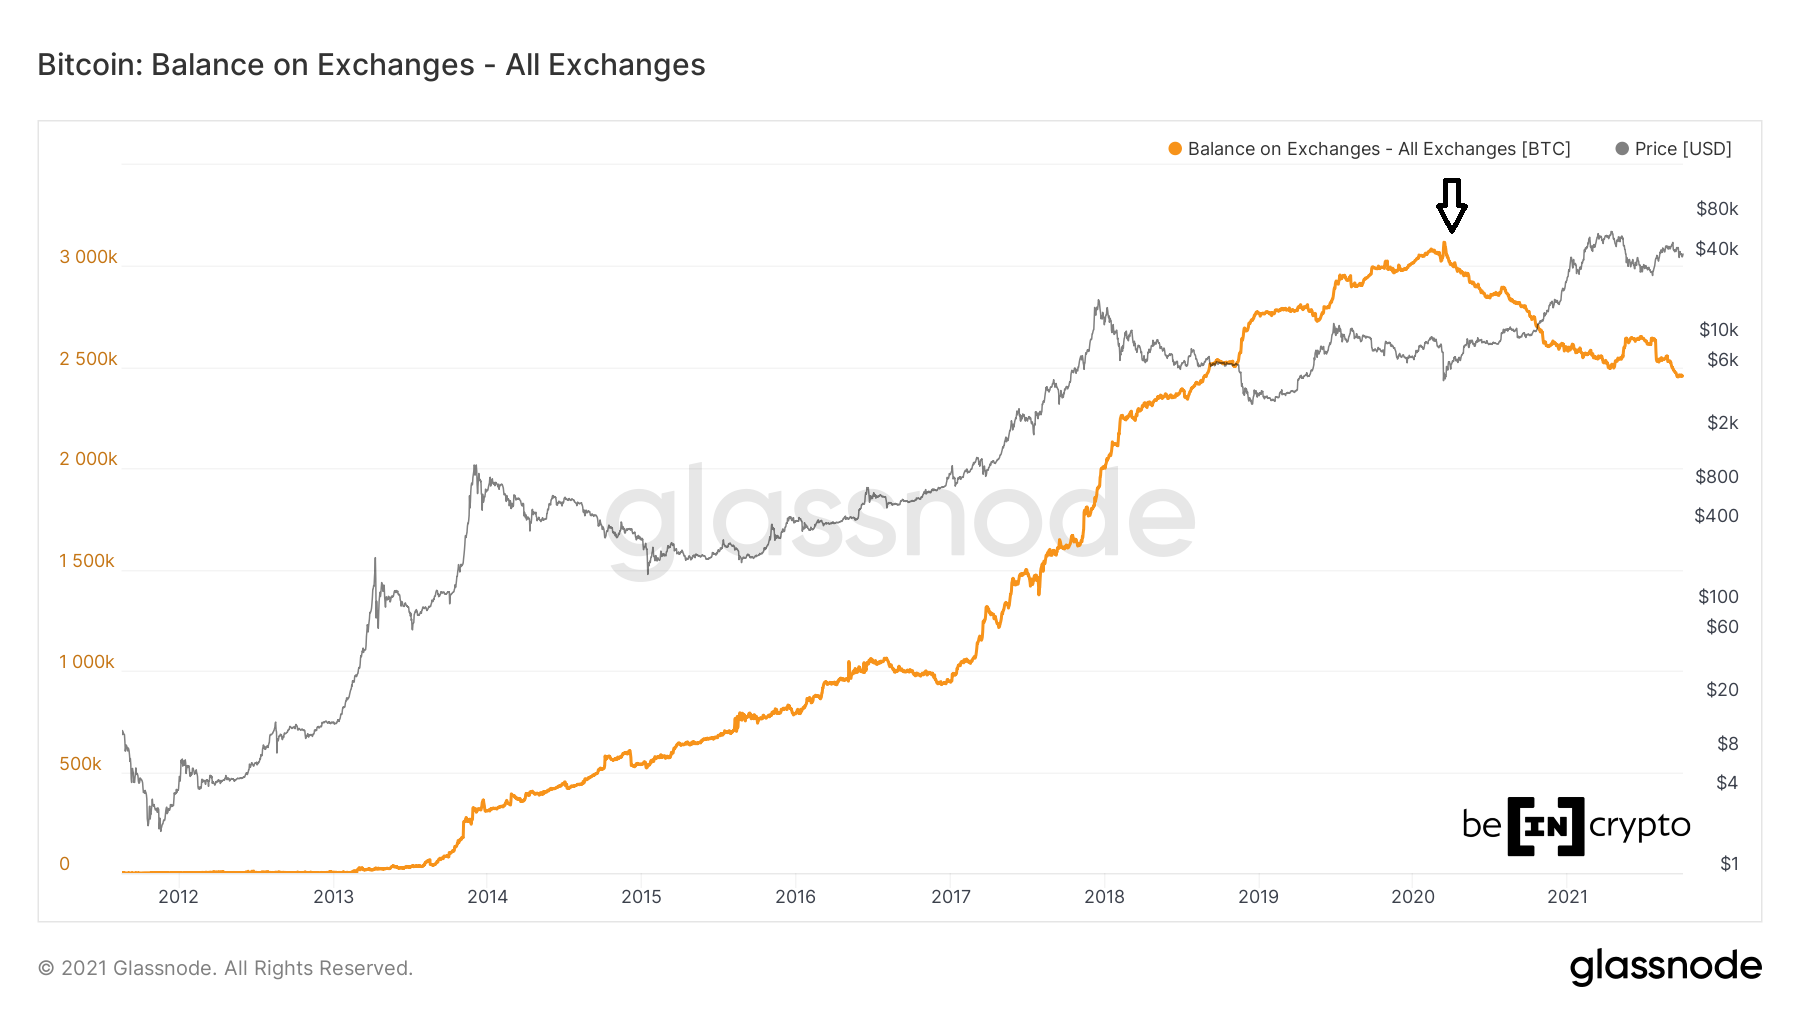 BTC Exchange balance